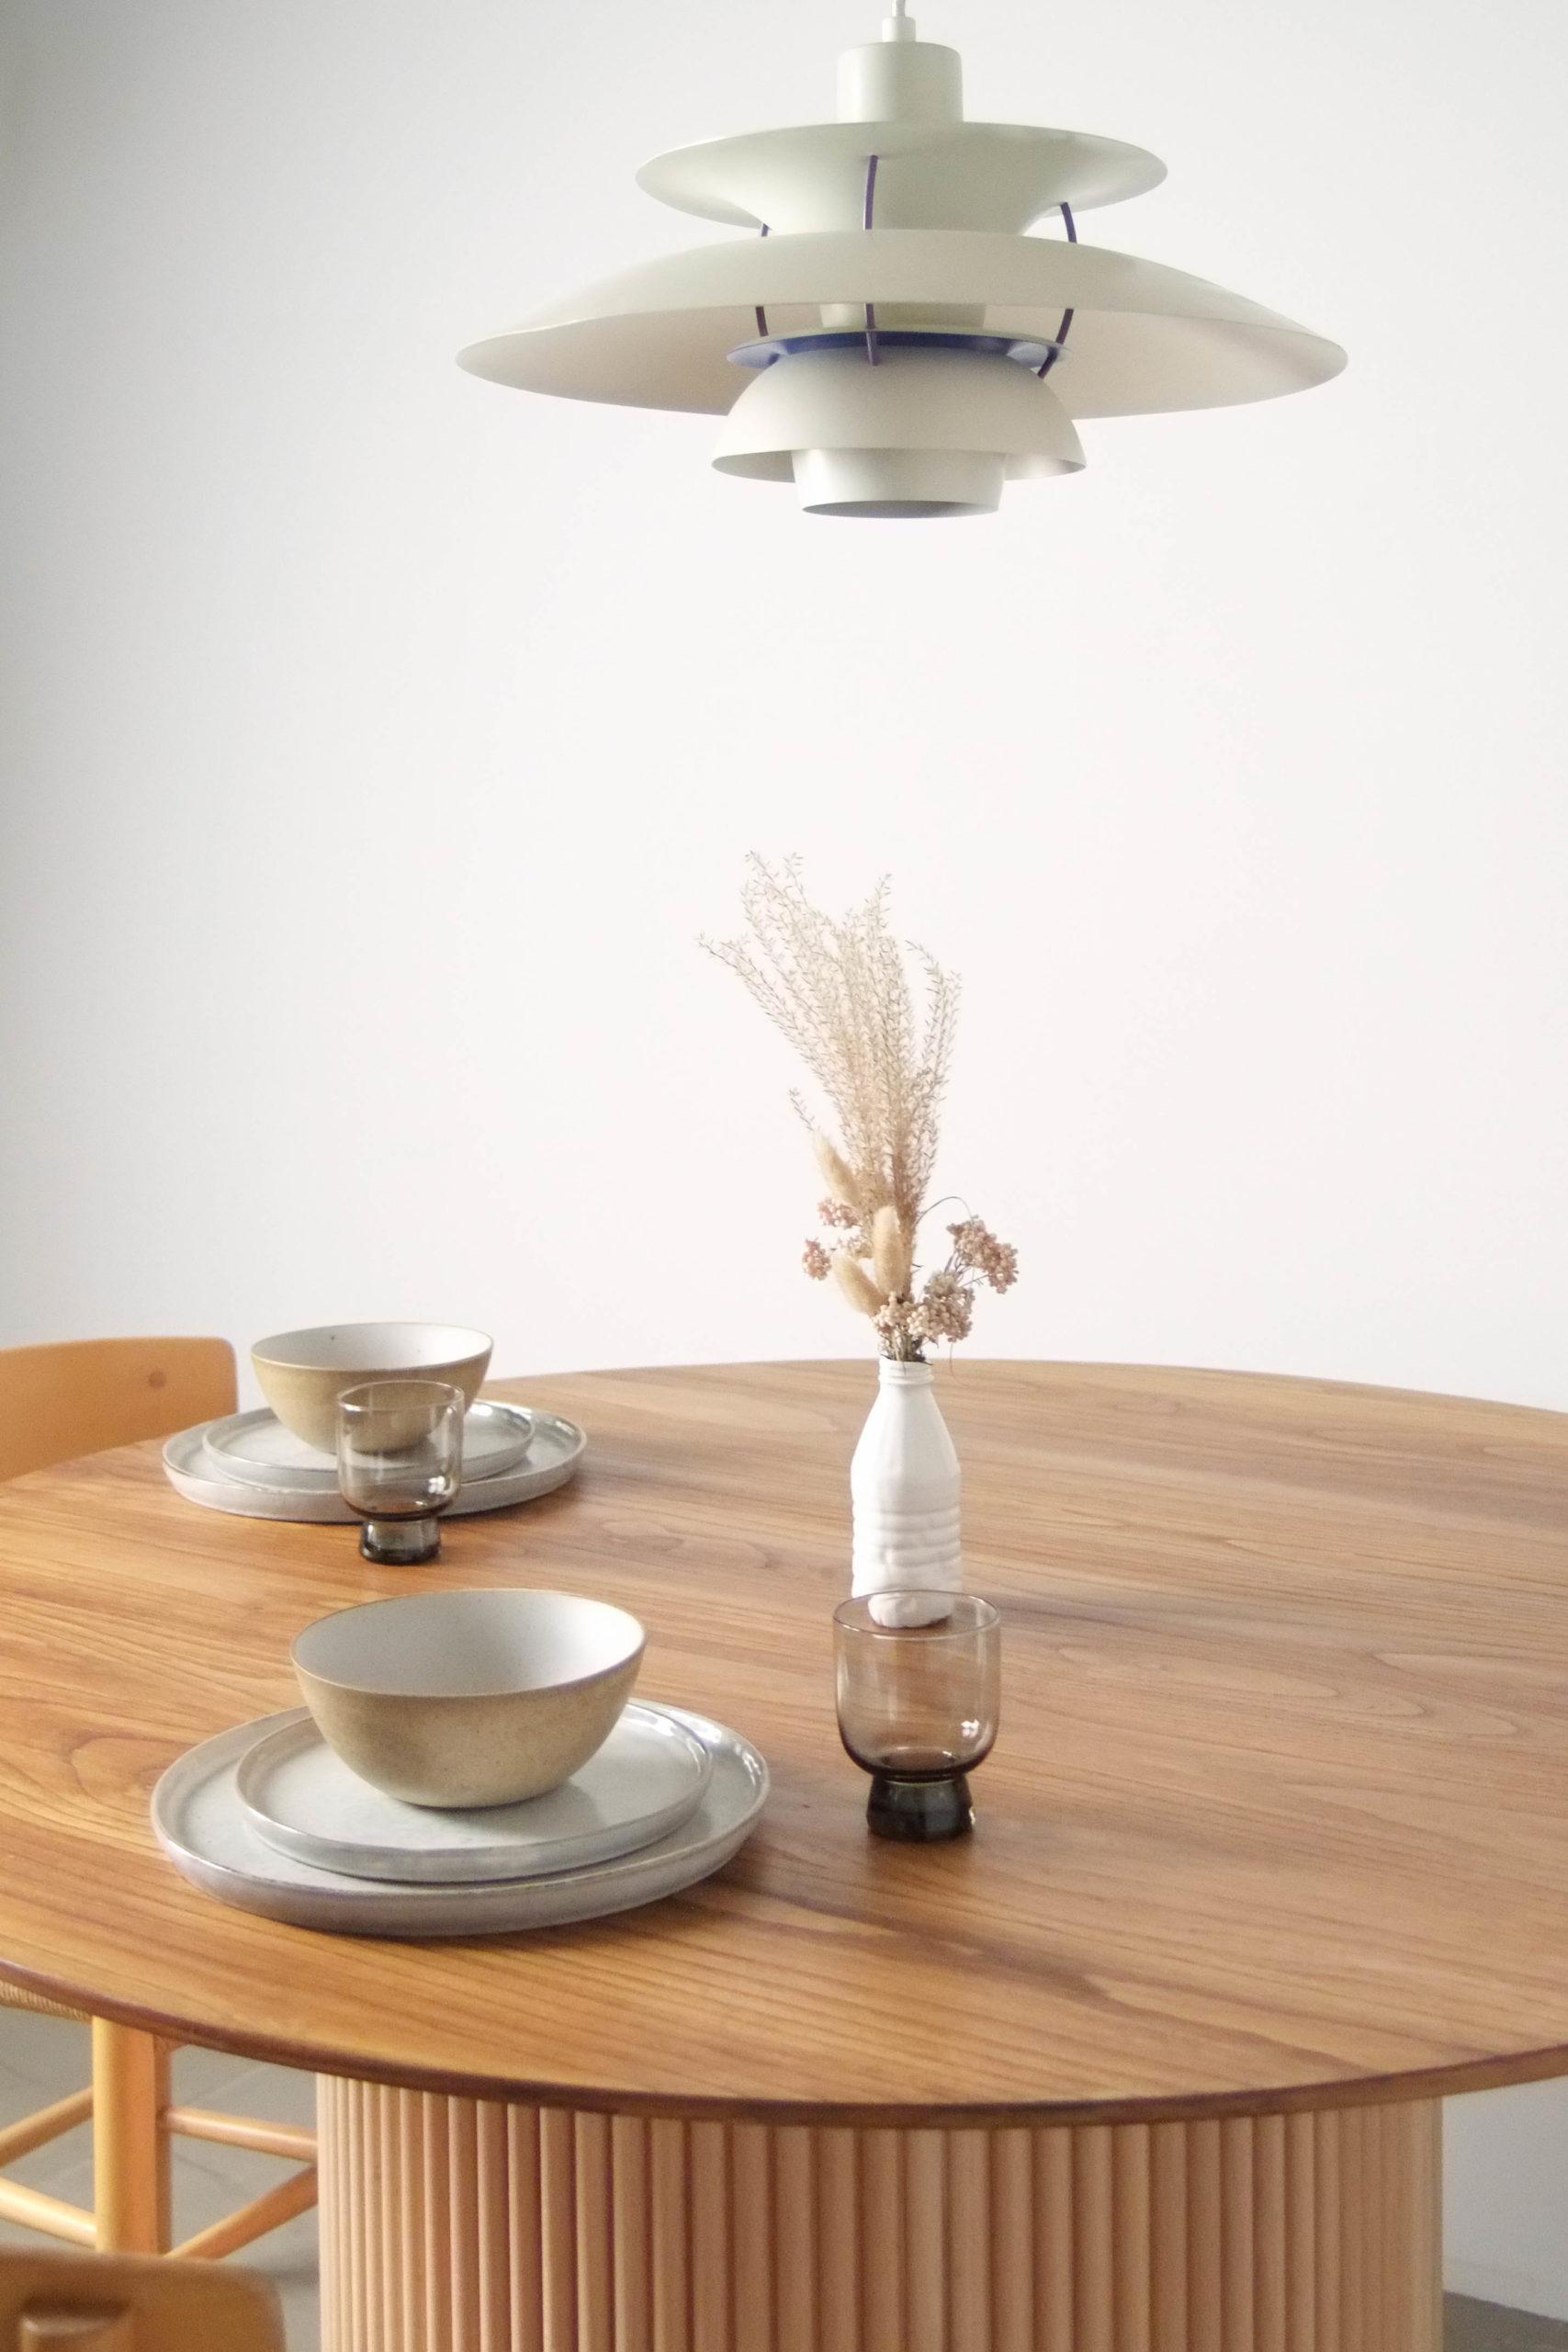 detalle de mesa sobre comedor cocina lampara decoracion